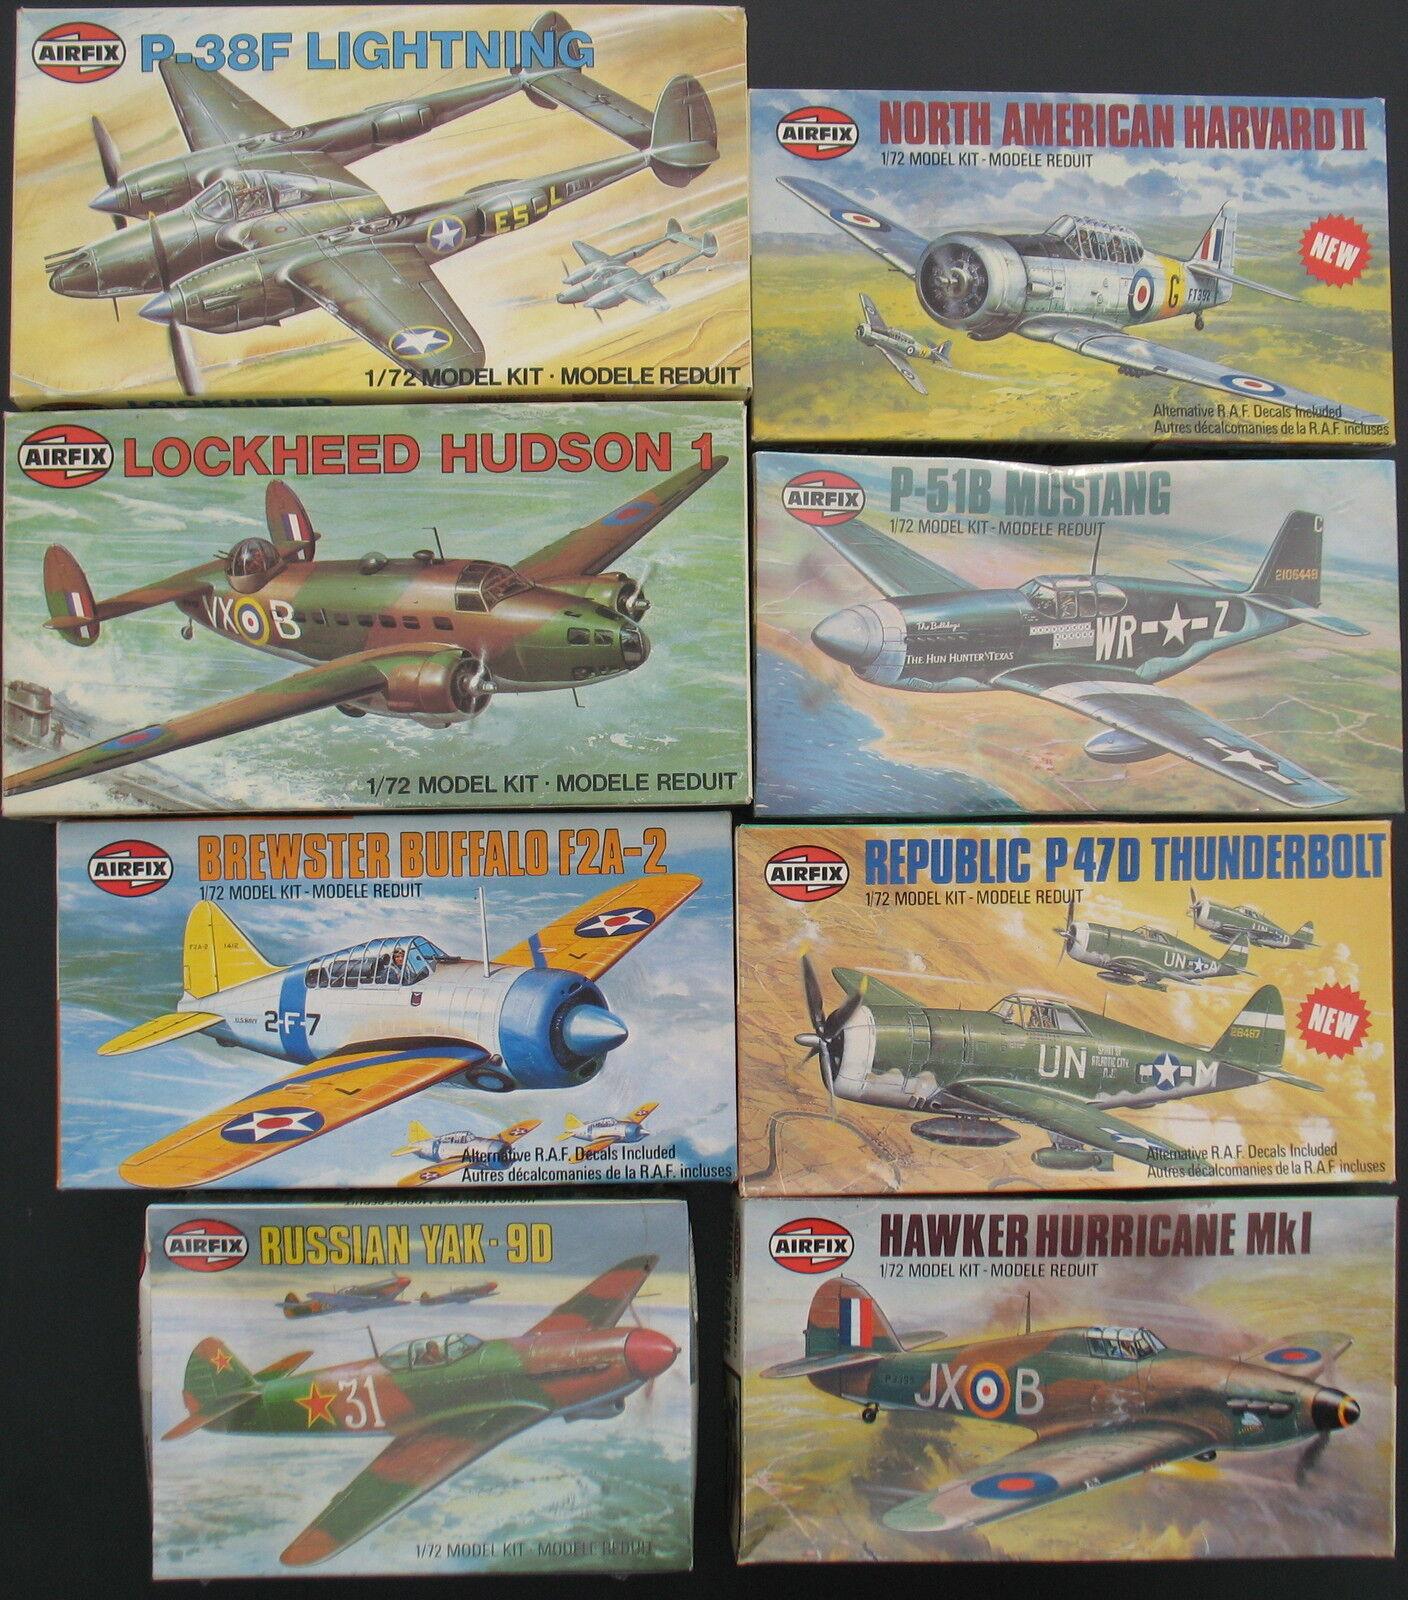 8x AIRFIX Flugzeug Modellbausätze - 1 1 1 72 - Model Kit - Sammlung Konvolut (7)  | Die Königin Der Qualität  d81367